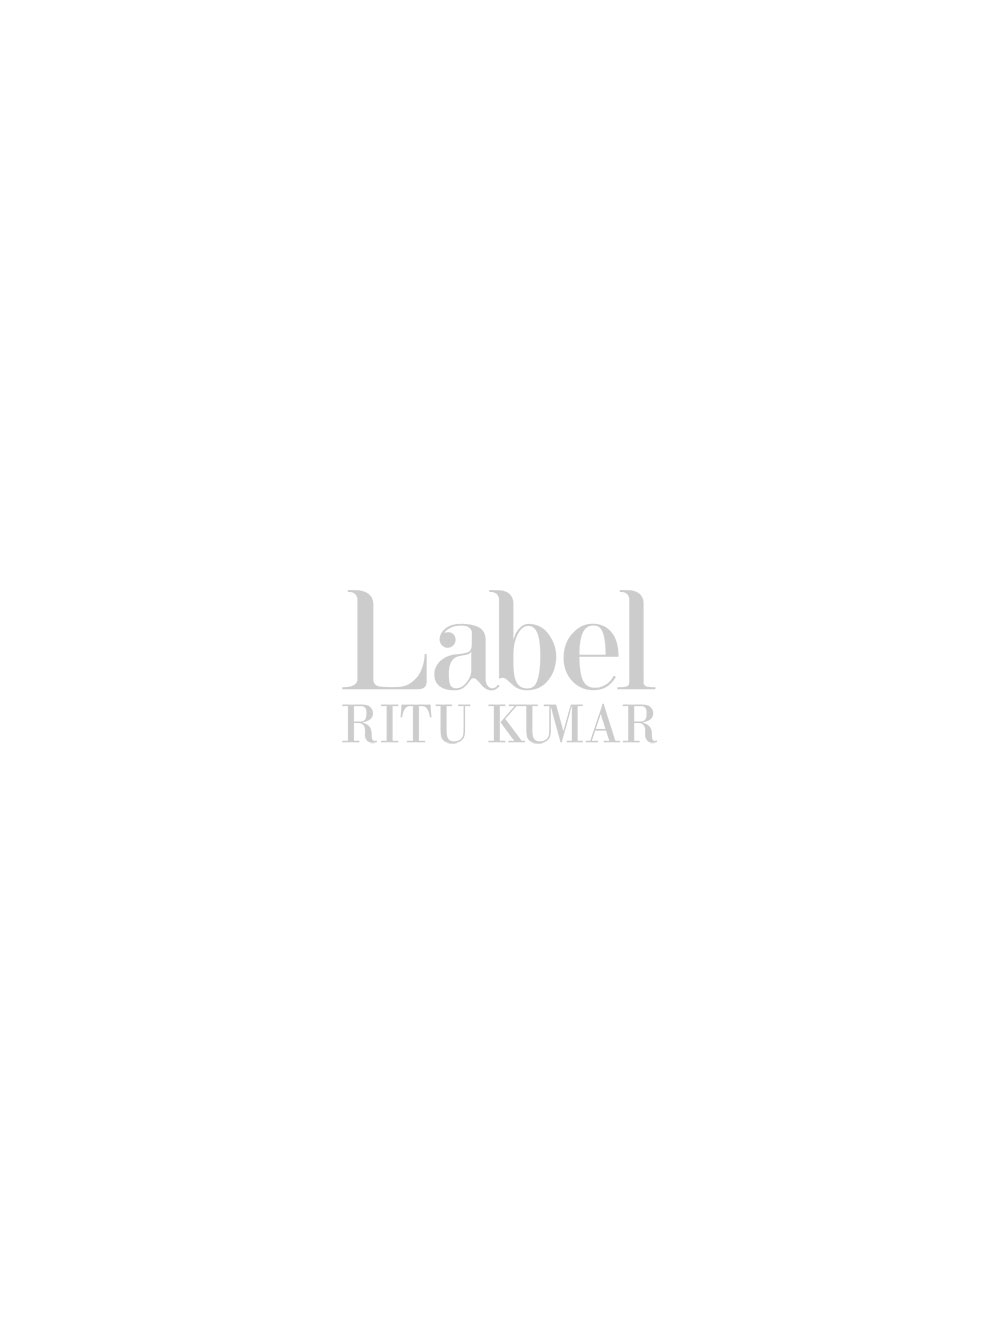 Blue Floral Dress By label Ritu Kumar